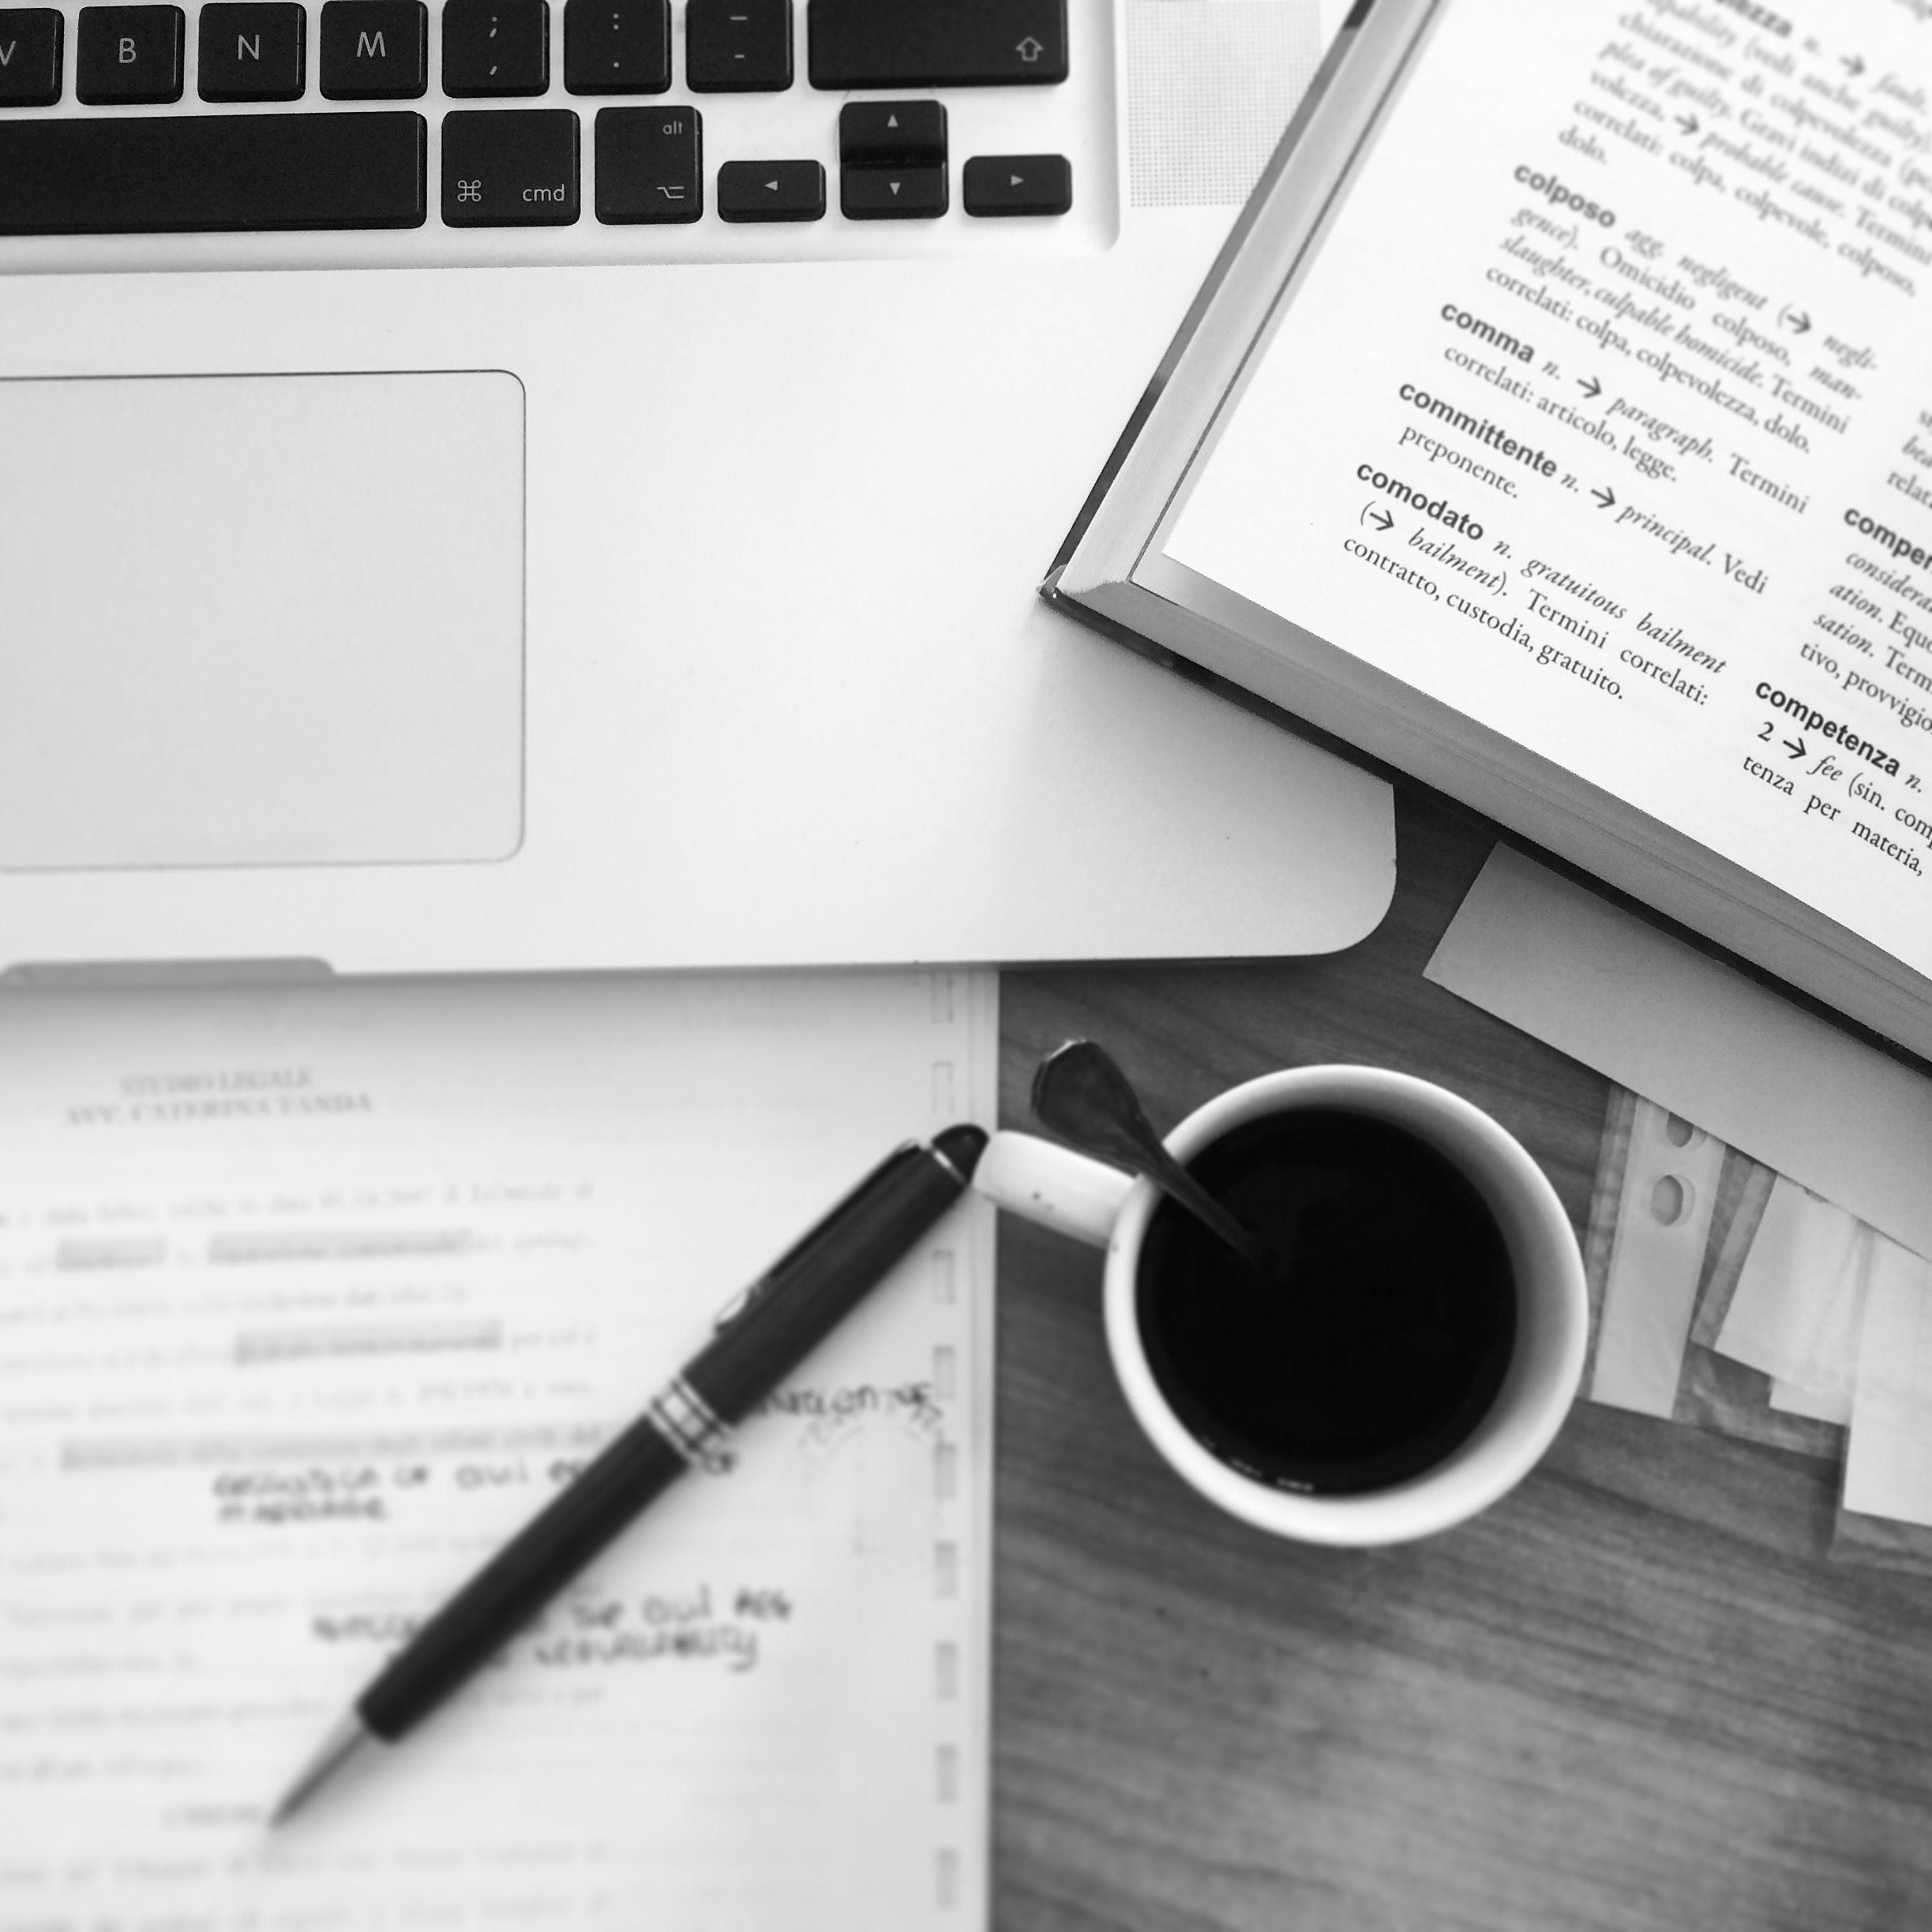 Carta Penna Dizionario Computer E Caffe I Big Five Di Ogni Traduttore Caffe Computer